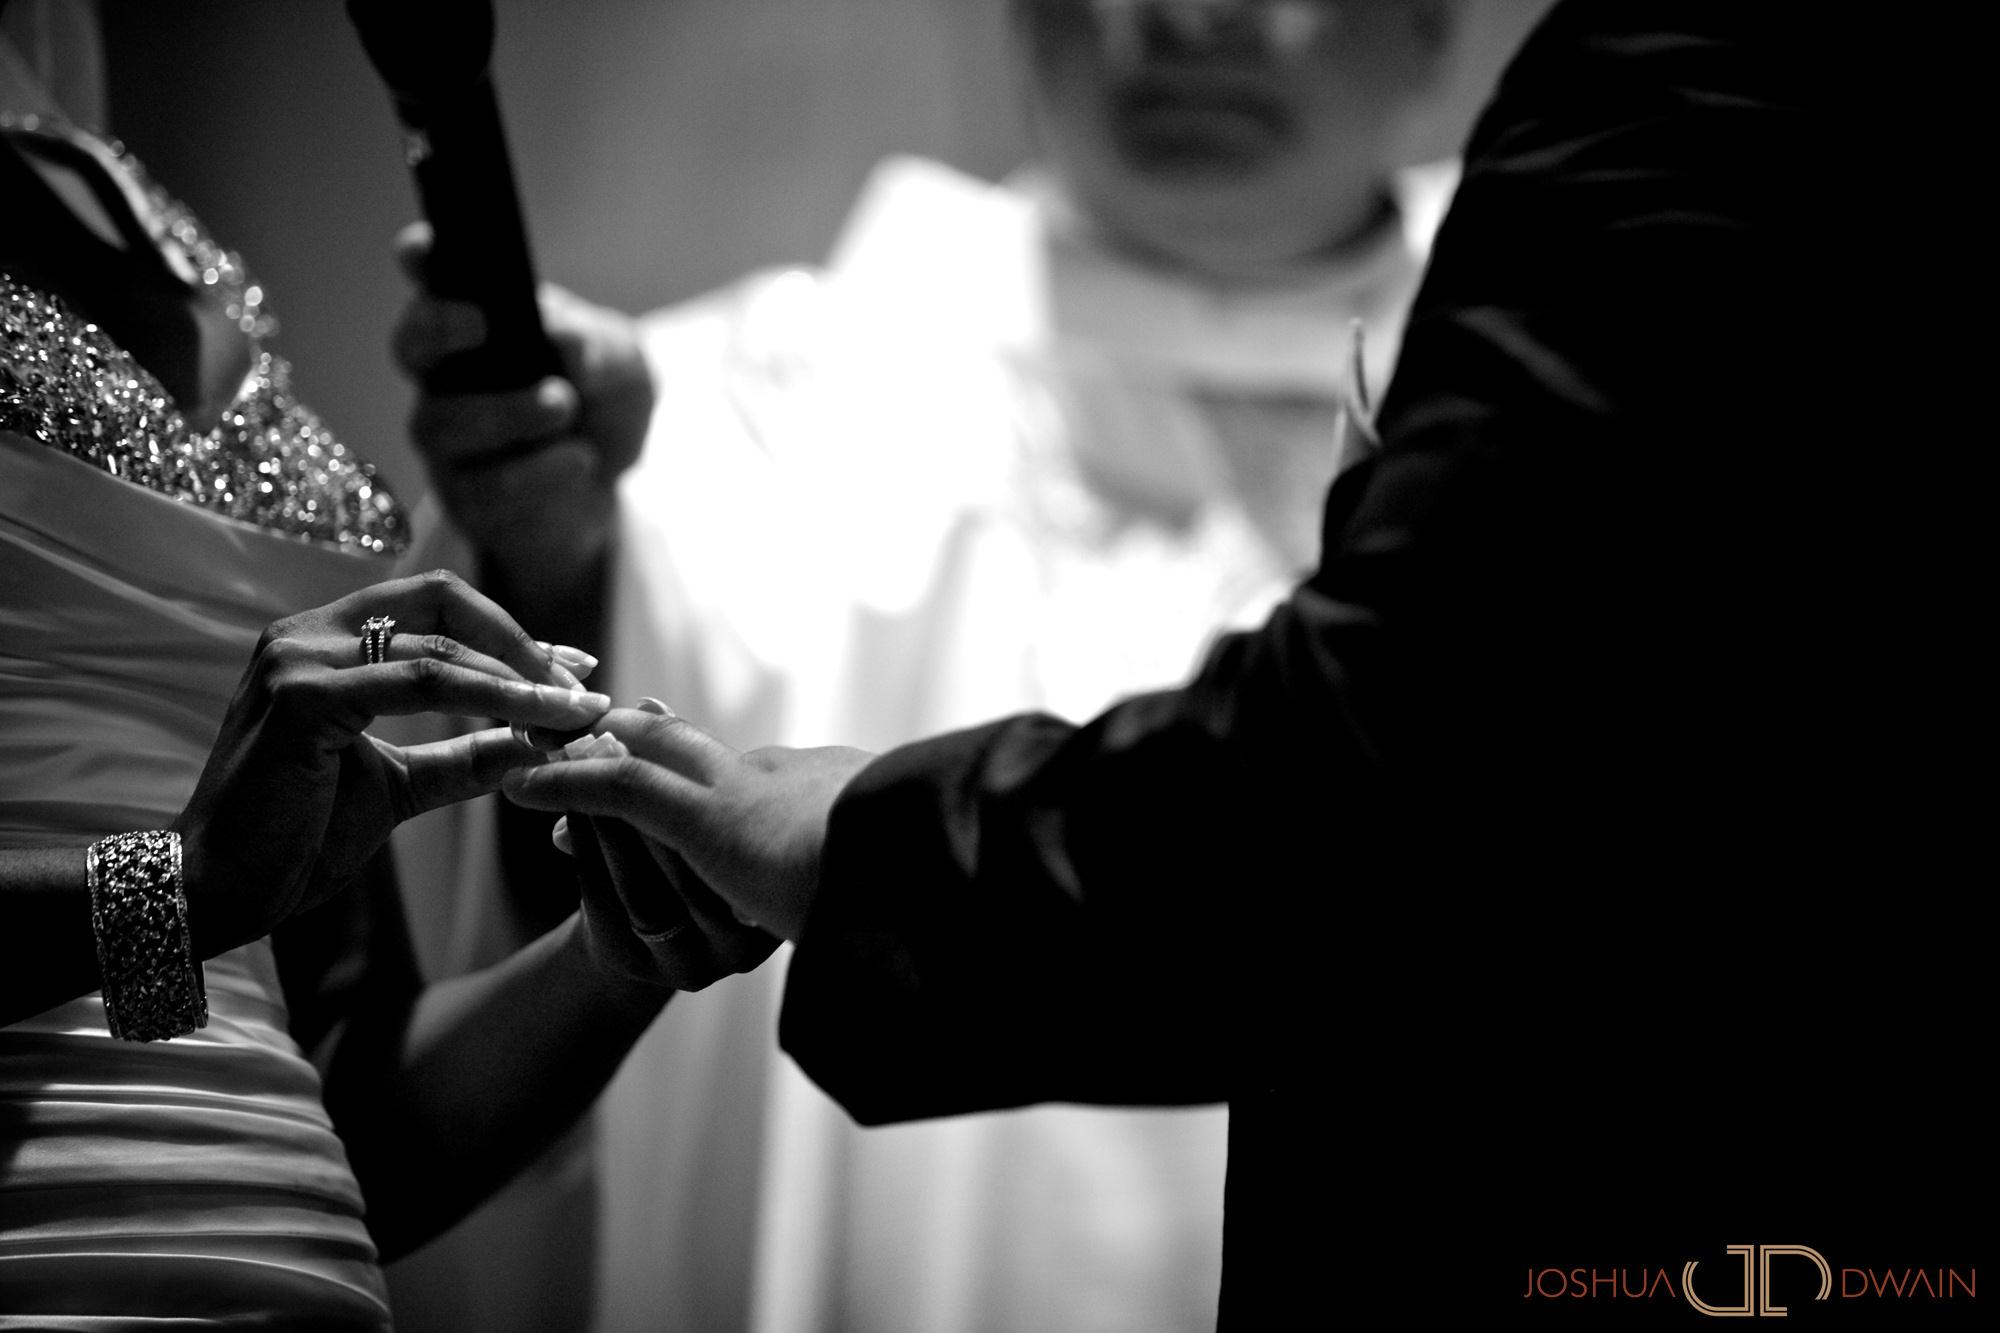 danielle-derek-011-the-imperia-somerset-new-jersey-wedding-photographer-joshua-dwain-danielle-derek-021-the-imperia-somerset-new-jerseywedding-photographer-joshua-dwain-2012-09-15_dd_239